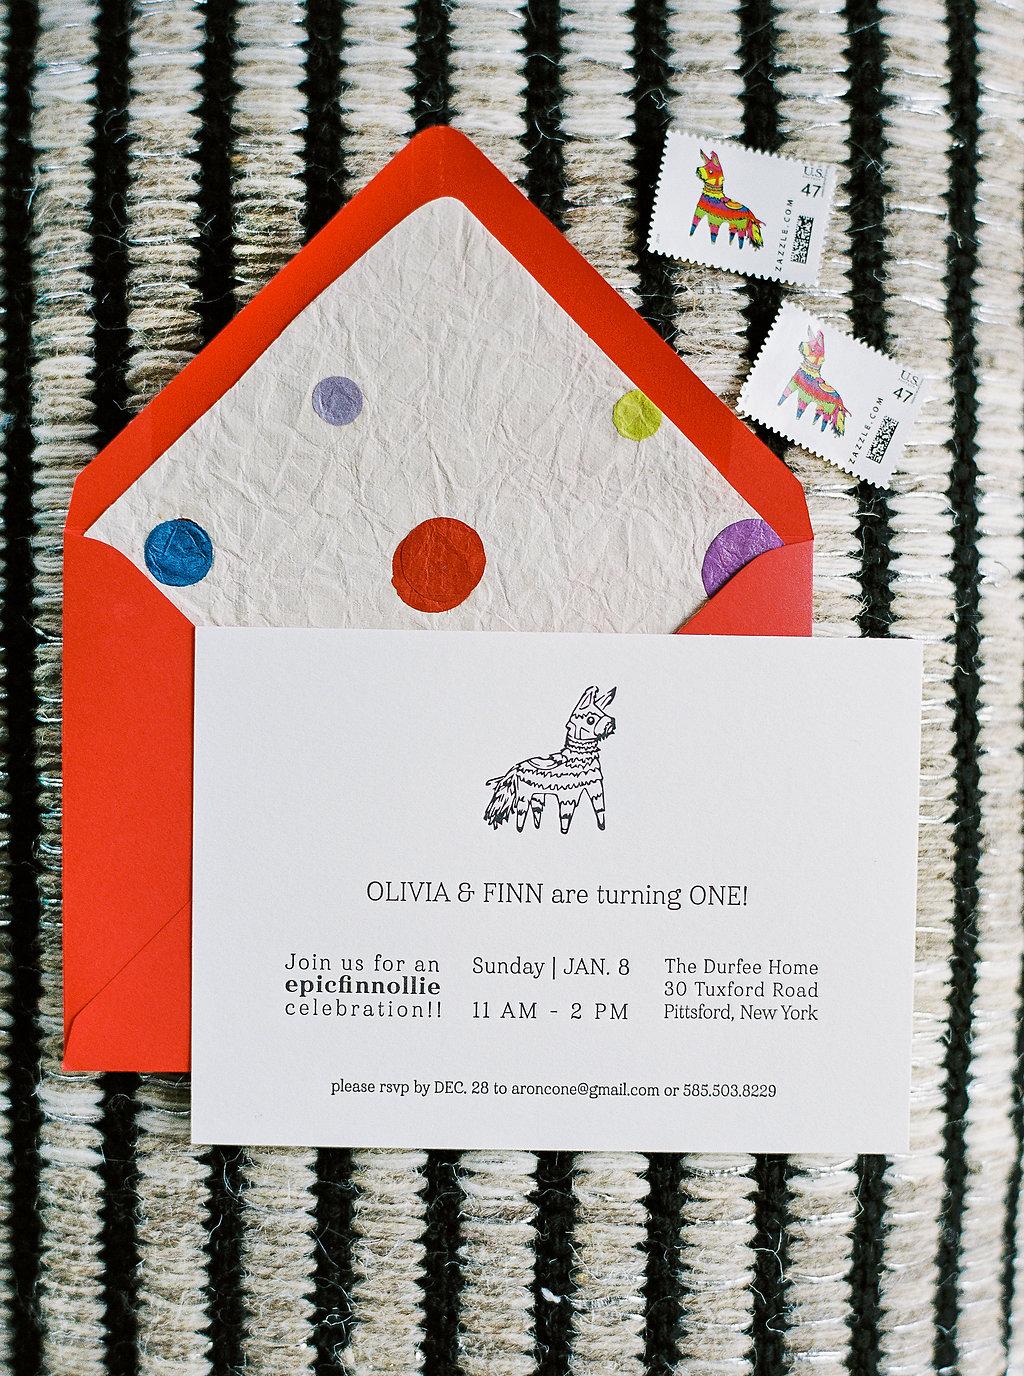 Alexandra-Elise-Photography-Ali-Reed-Louelle-Design-Studio-Invitations-033.jpg